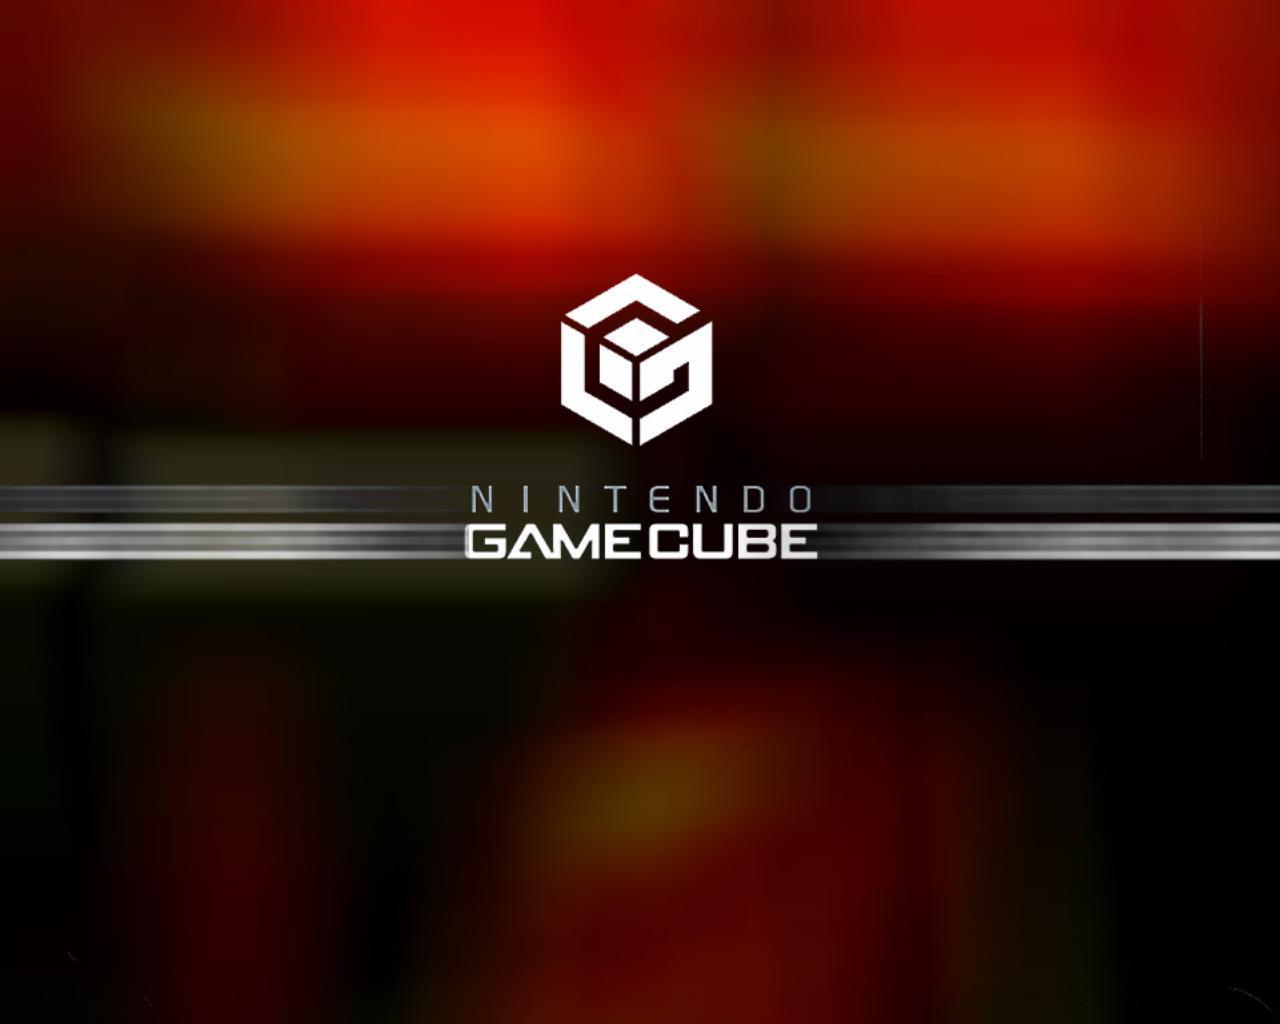 Gamecube Wallpapers Wallpaper Cave